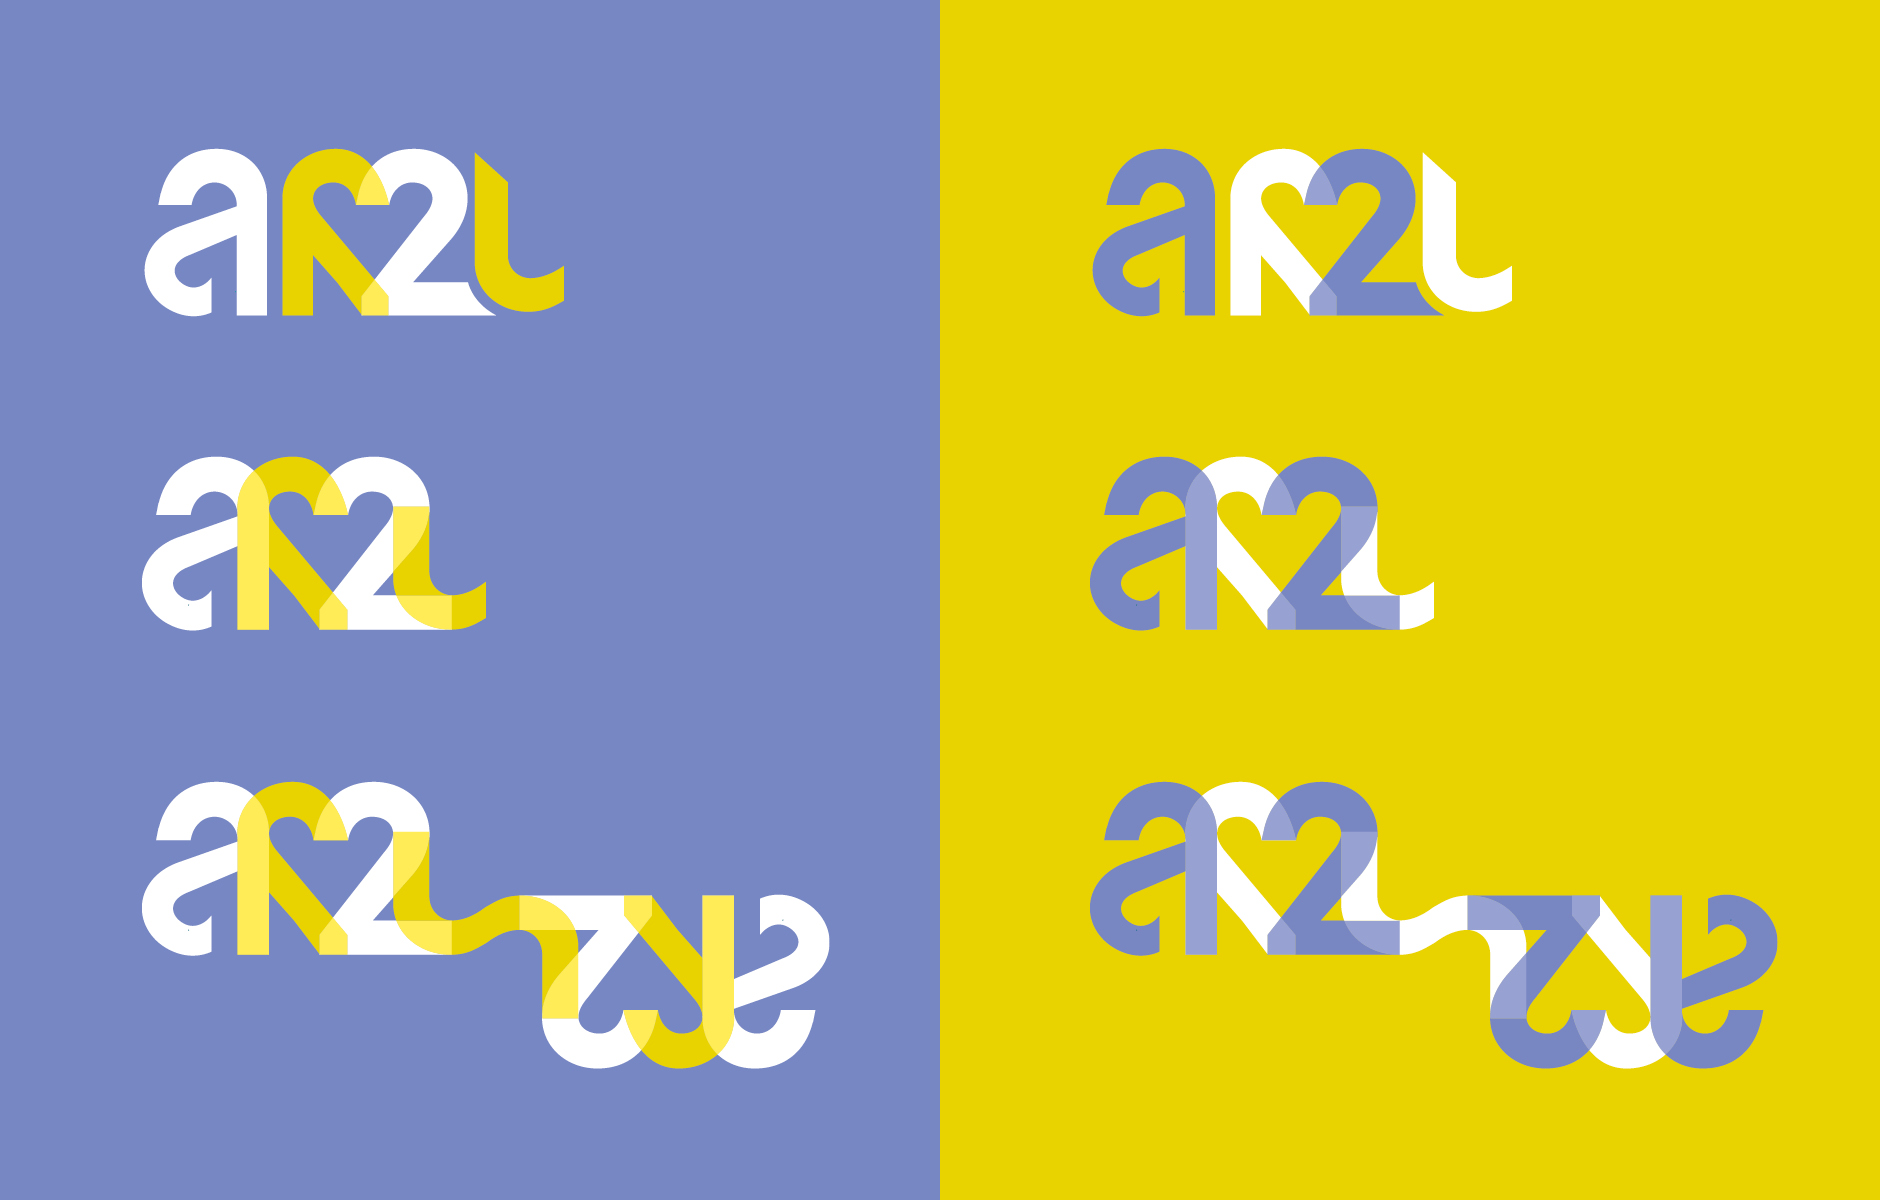 logotype, identité visuelle, design graphique, branding, communication, amiens, okowoko